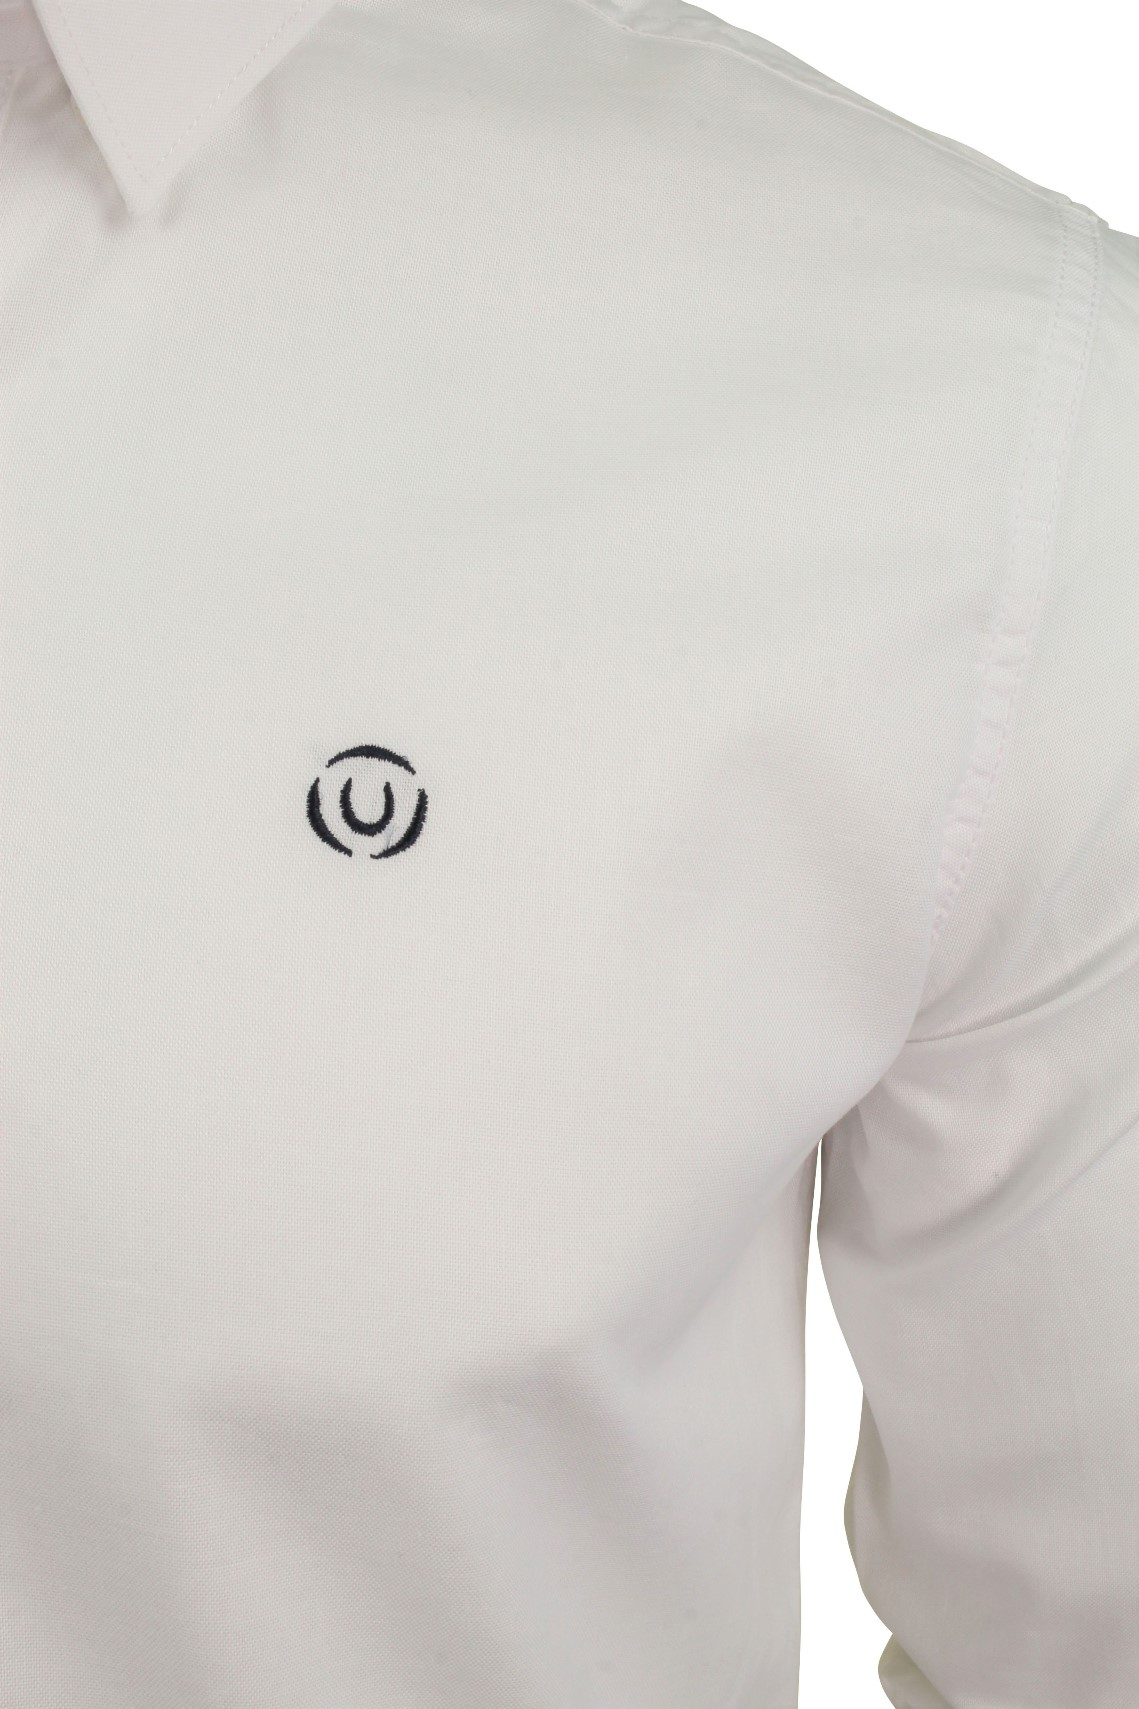 Para-hombres-camisa-de-manga-larga-por-Pato-Y-Cubierta-039-abedul-039 miniatura 13